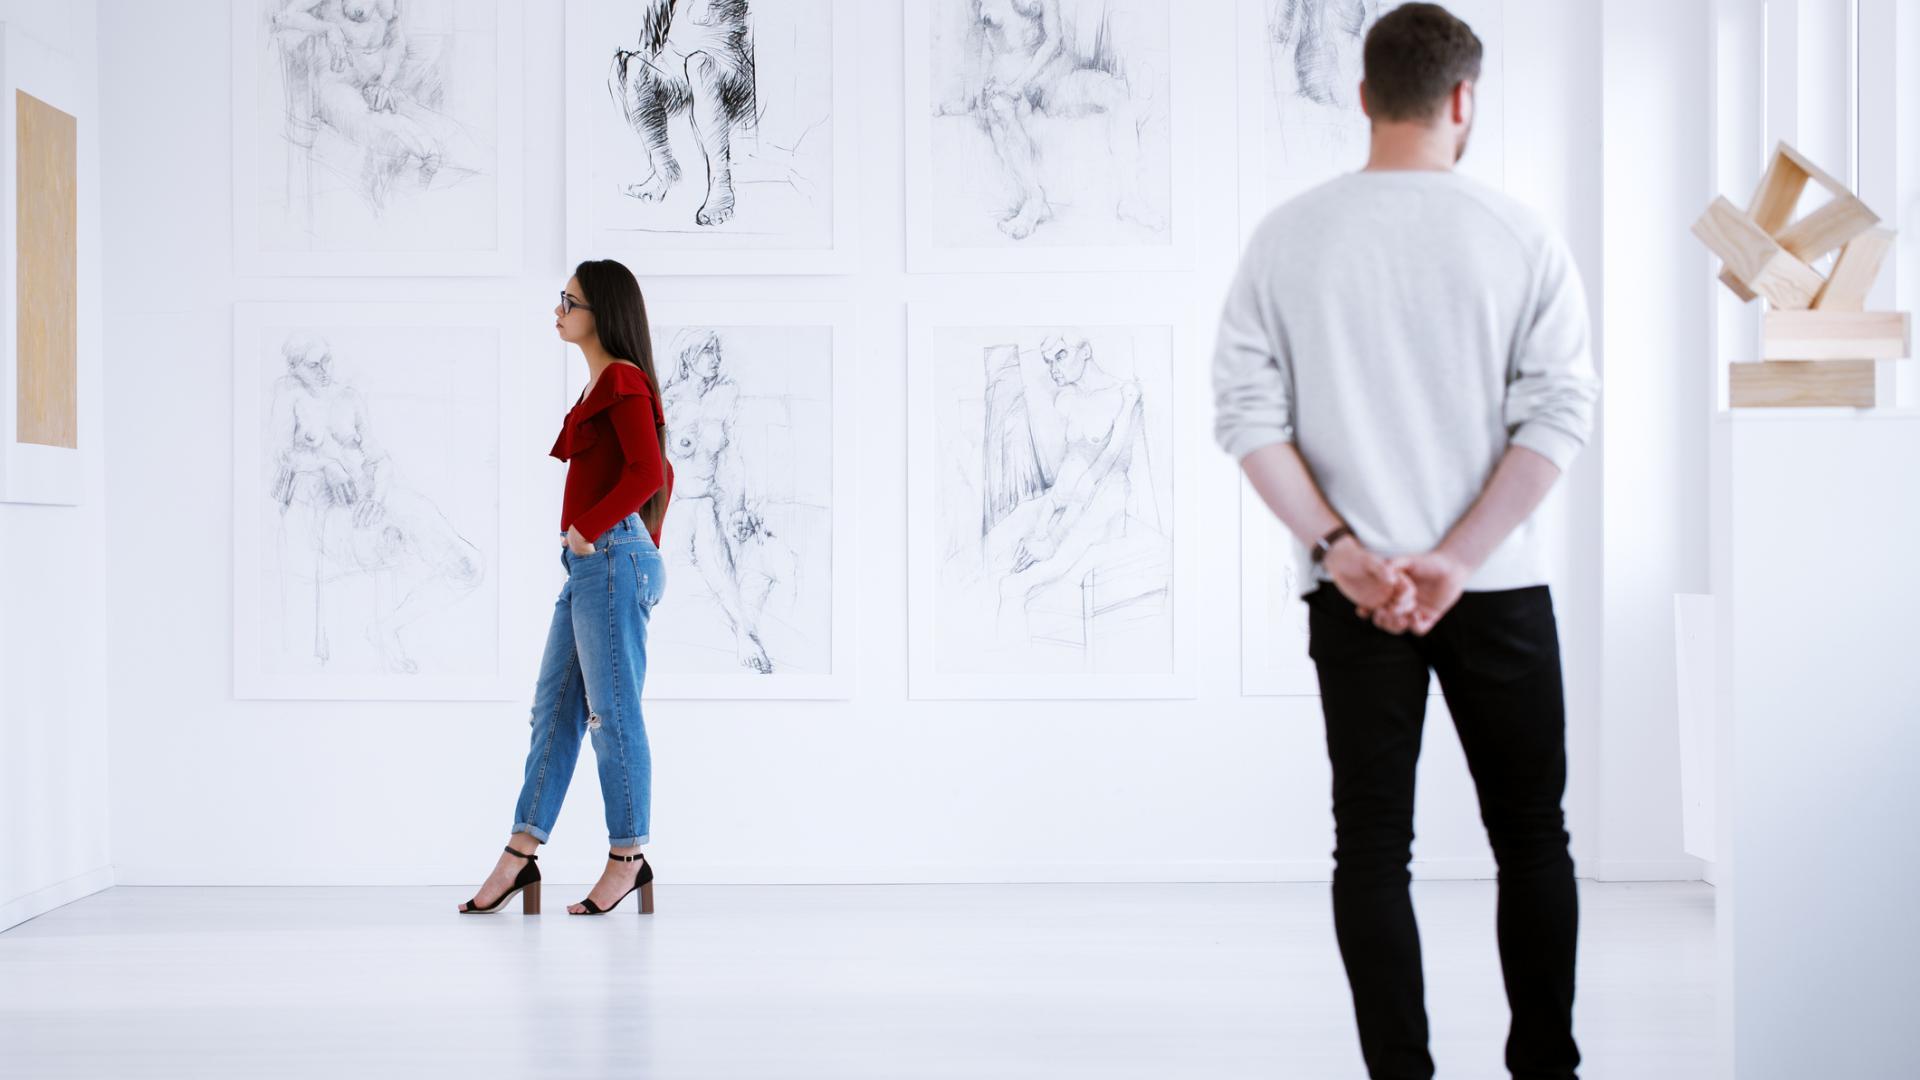 Kunstausstellung frau mann vernissage